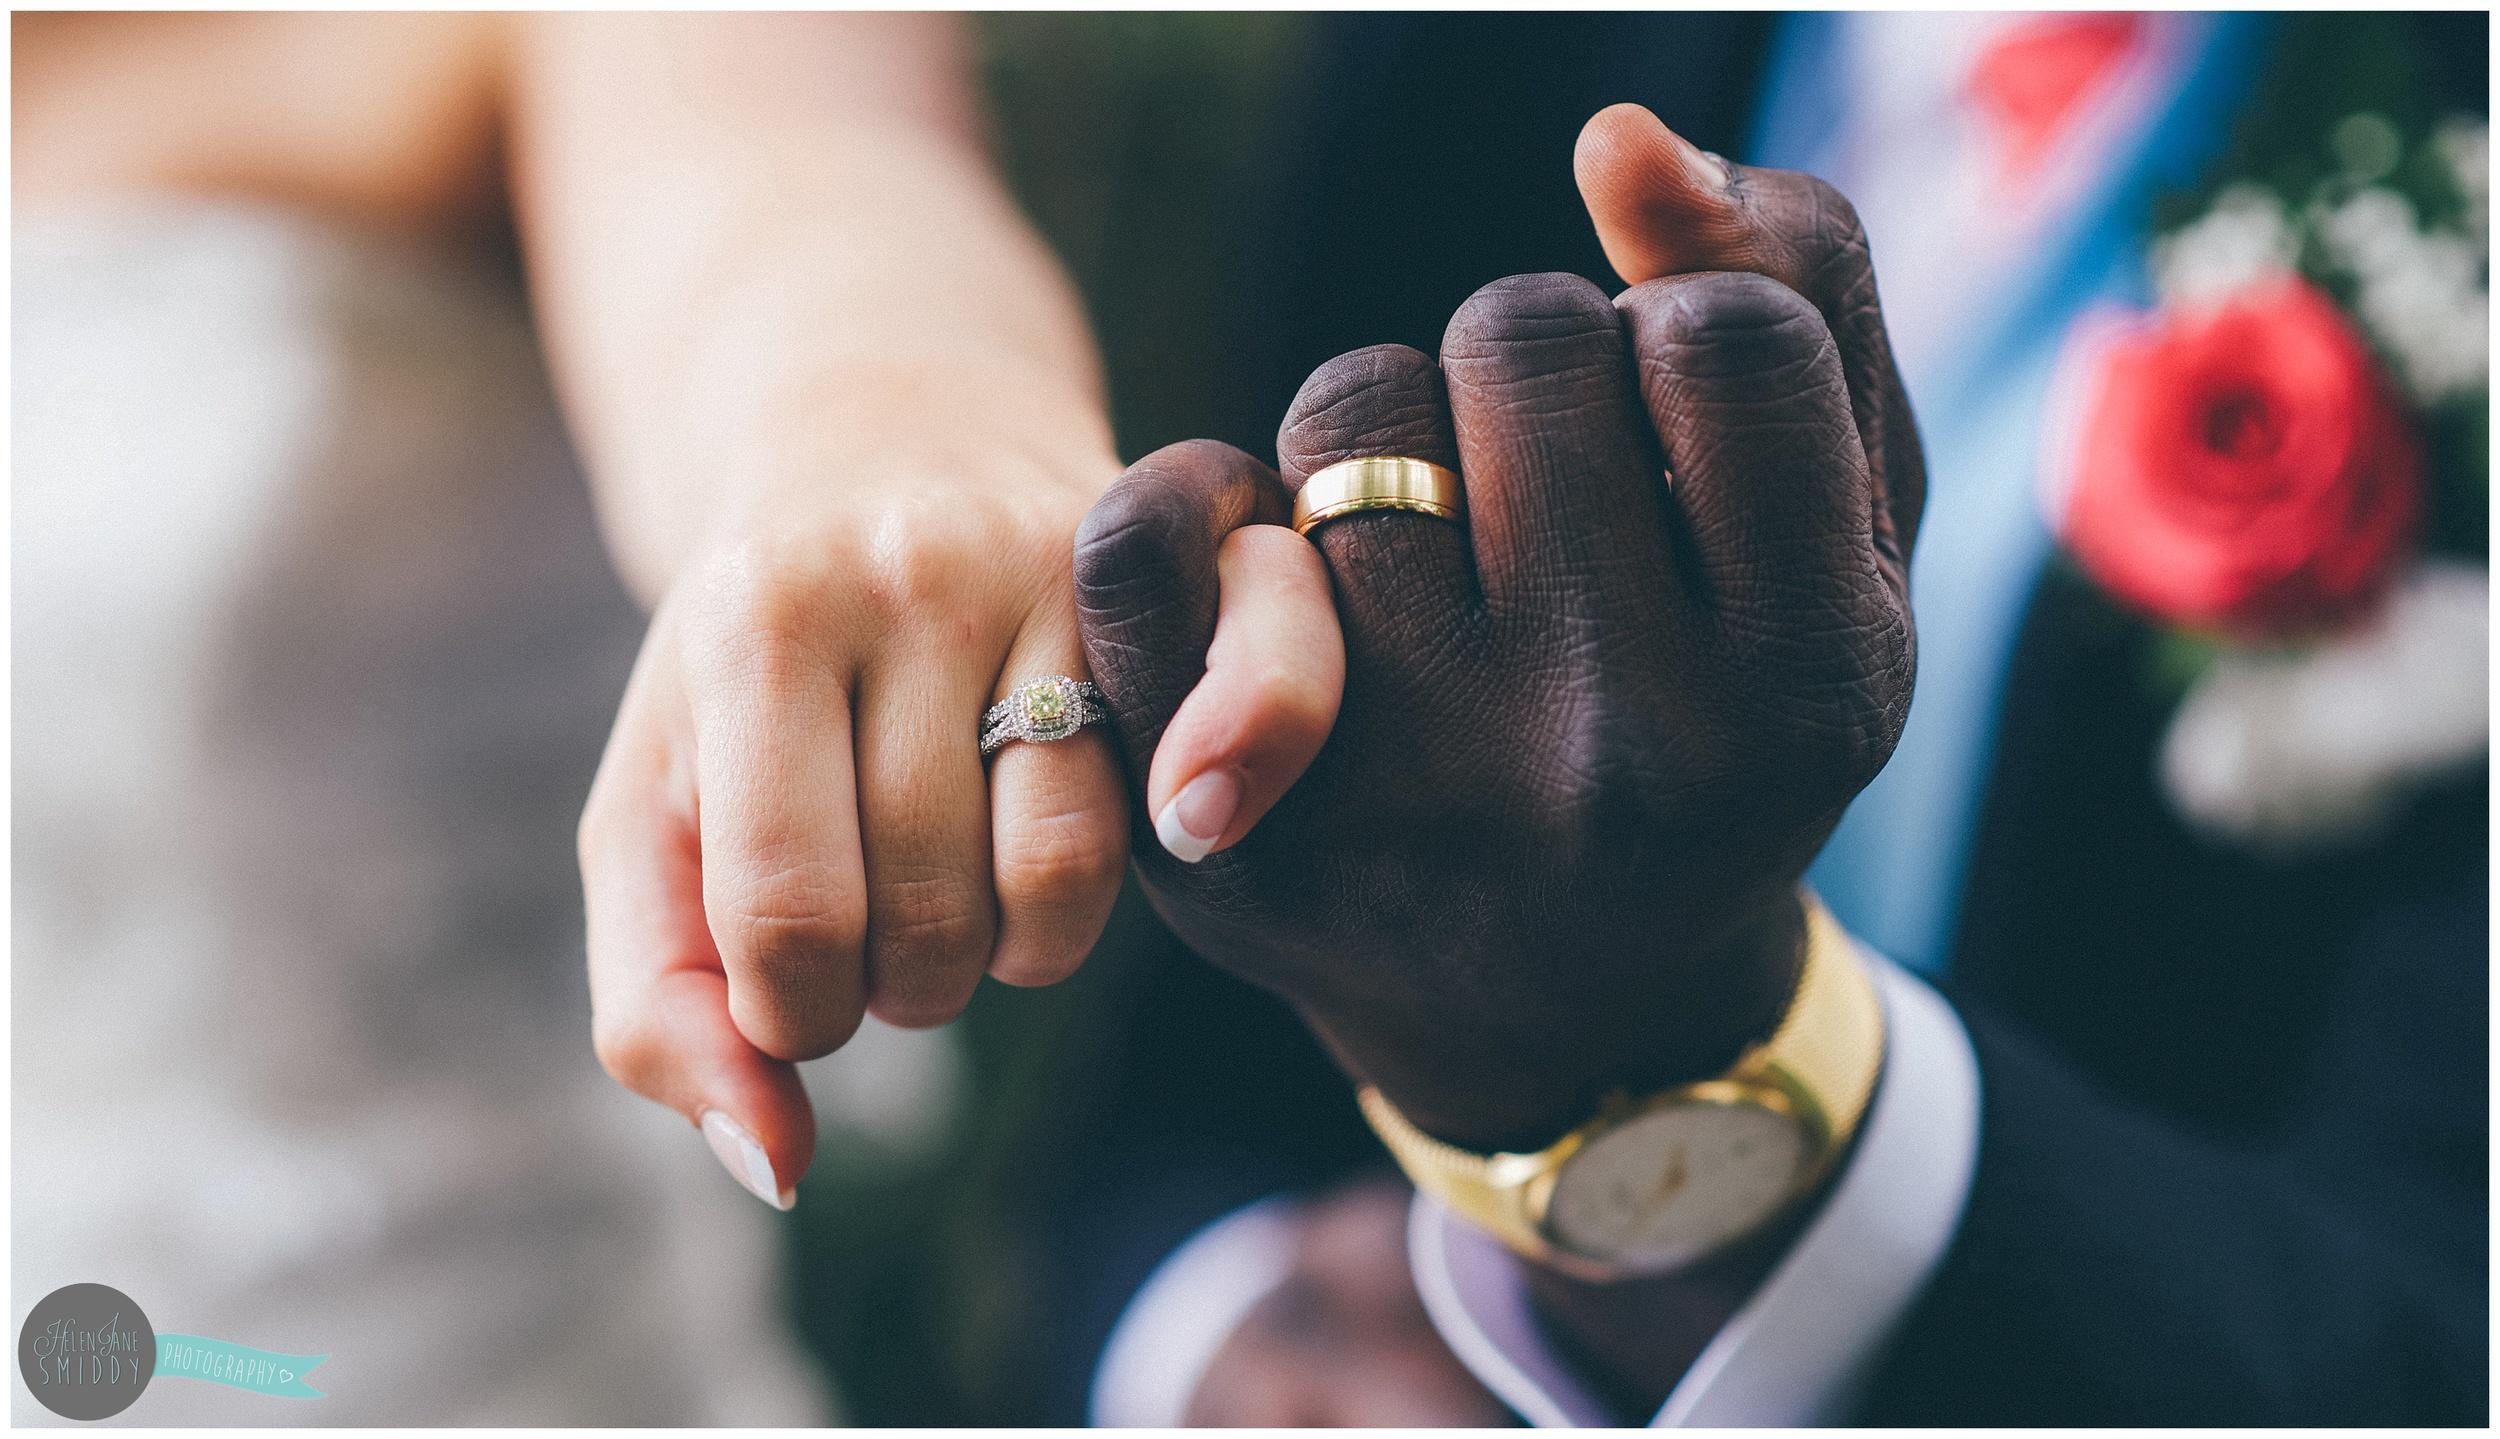 wedding-photography-crabwall-manor-cheshire-wedding-photographer-north-west-england-nigerian-wedding-balloons-diamonds